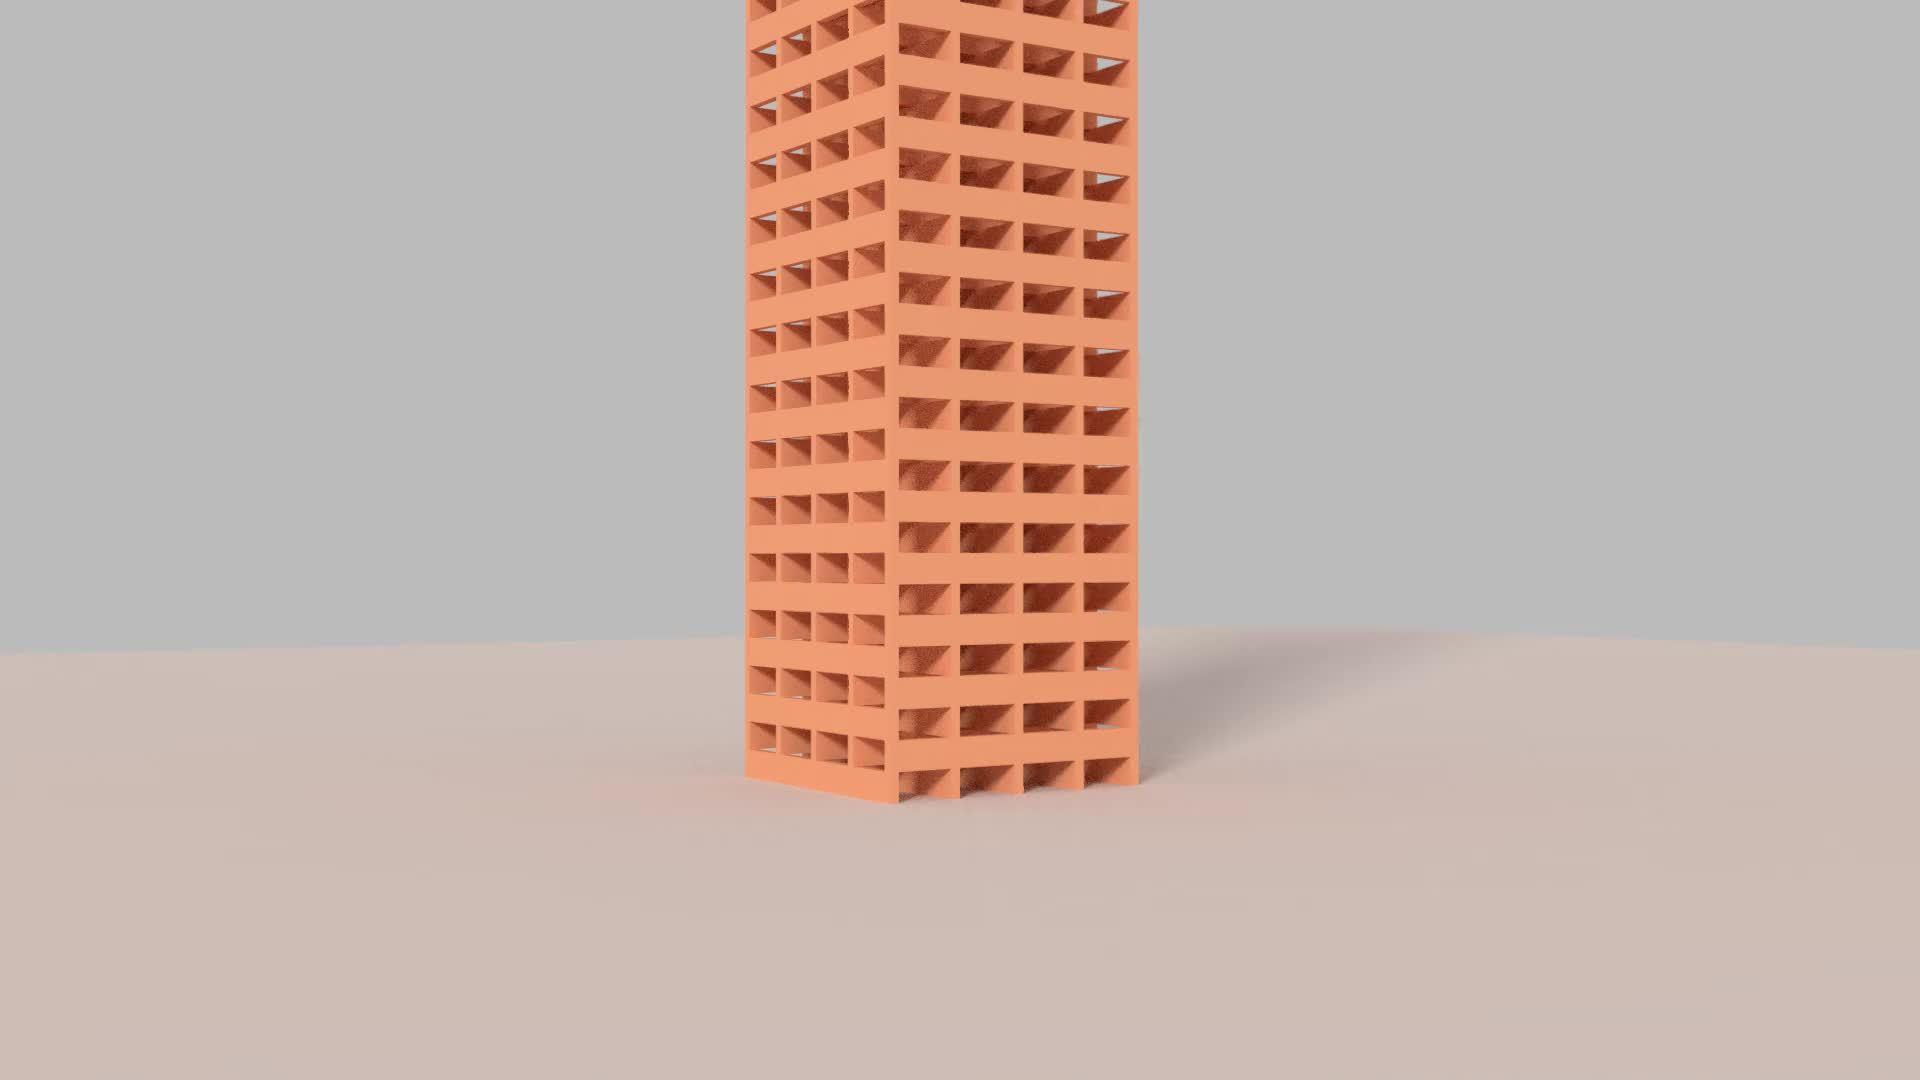 60fps, blender, cool, Towerfall GIFs